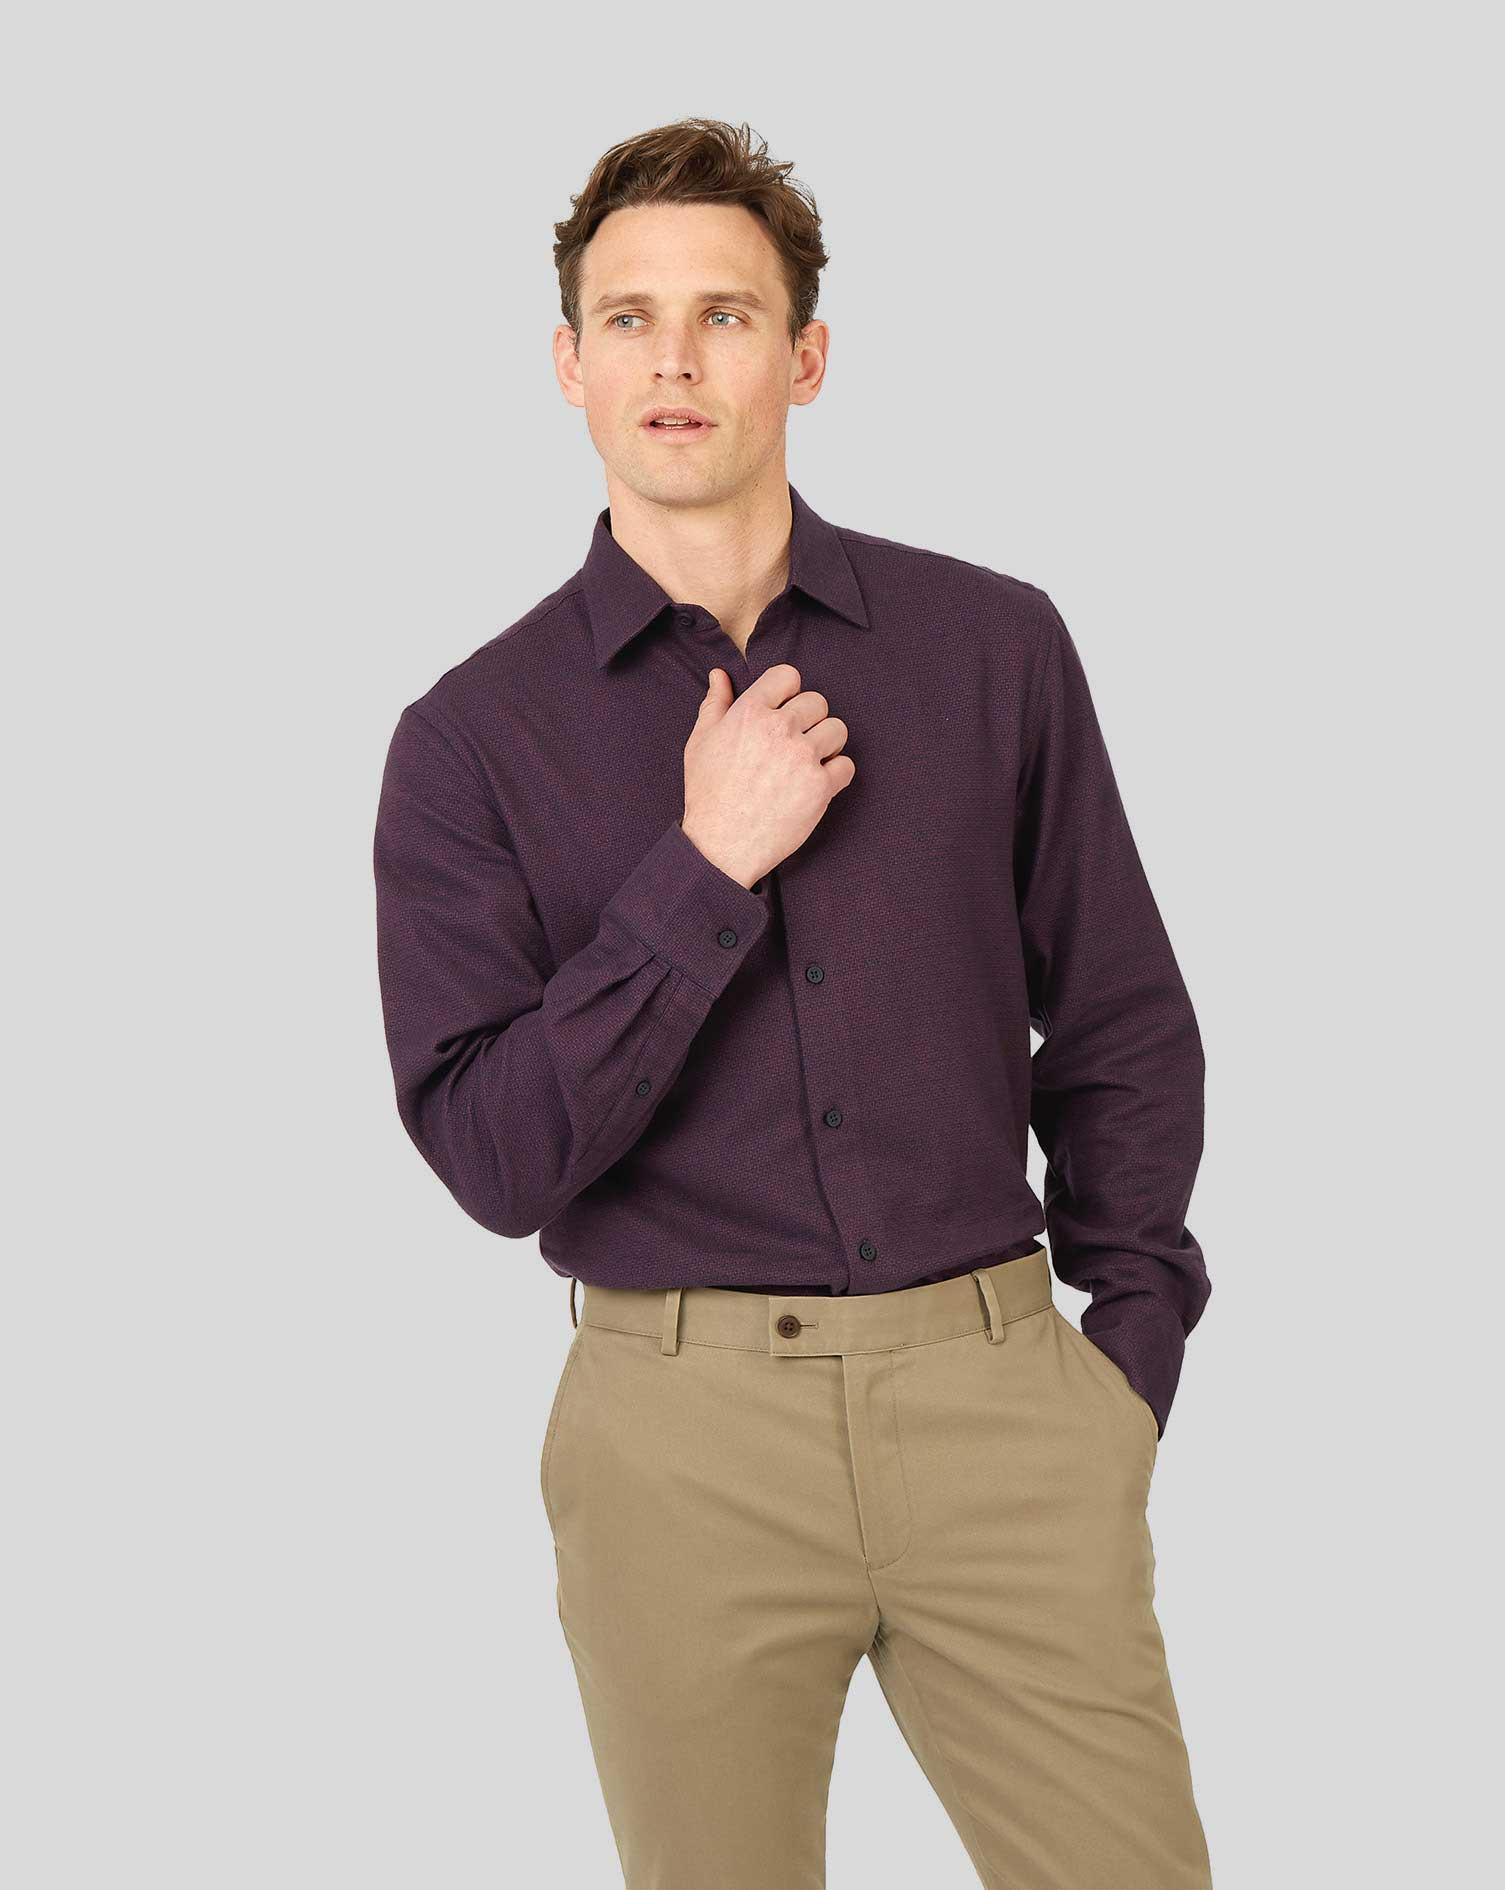 Image of Charles Tyrwhitt Classic Collar Dobby Flannel Textured Cotton Shirt - Berry & Navy Single Cuff Size Medium by Charles Tyrwhitt